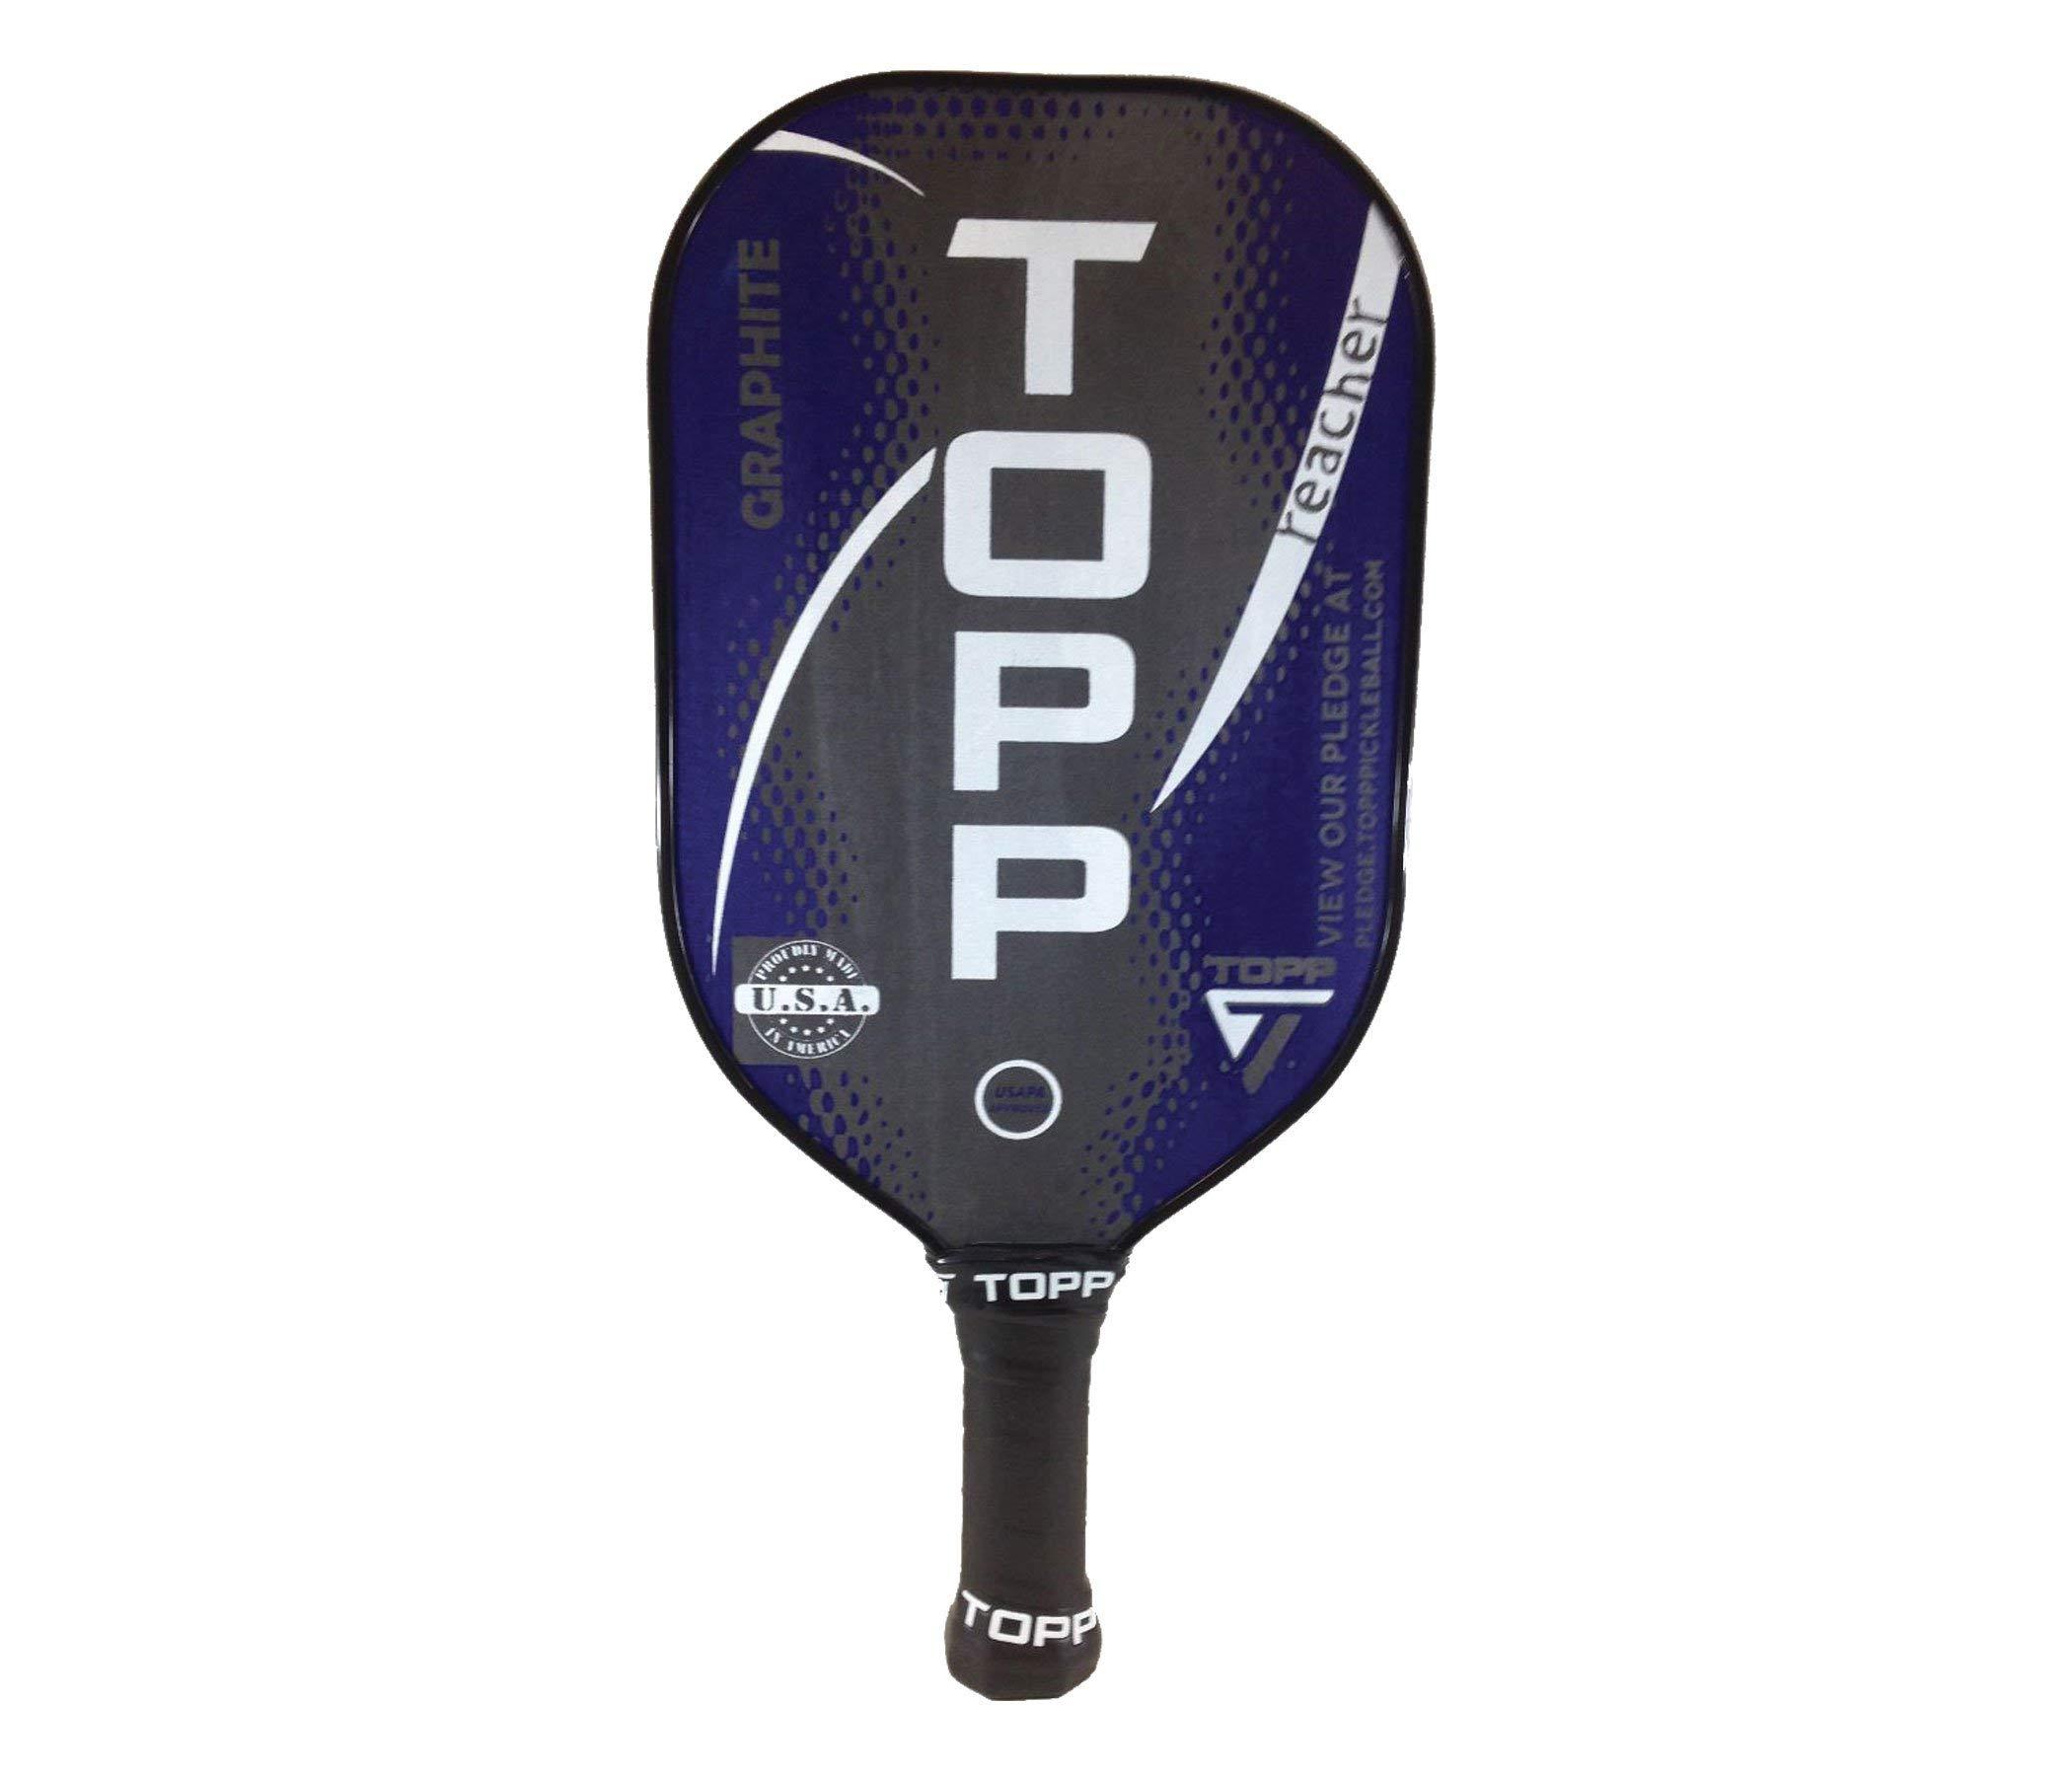 Topp Pickleball Paddle Reacher Graphite Blade -51YH